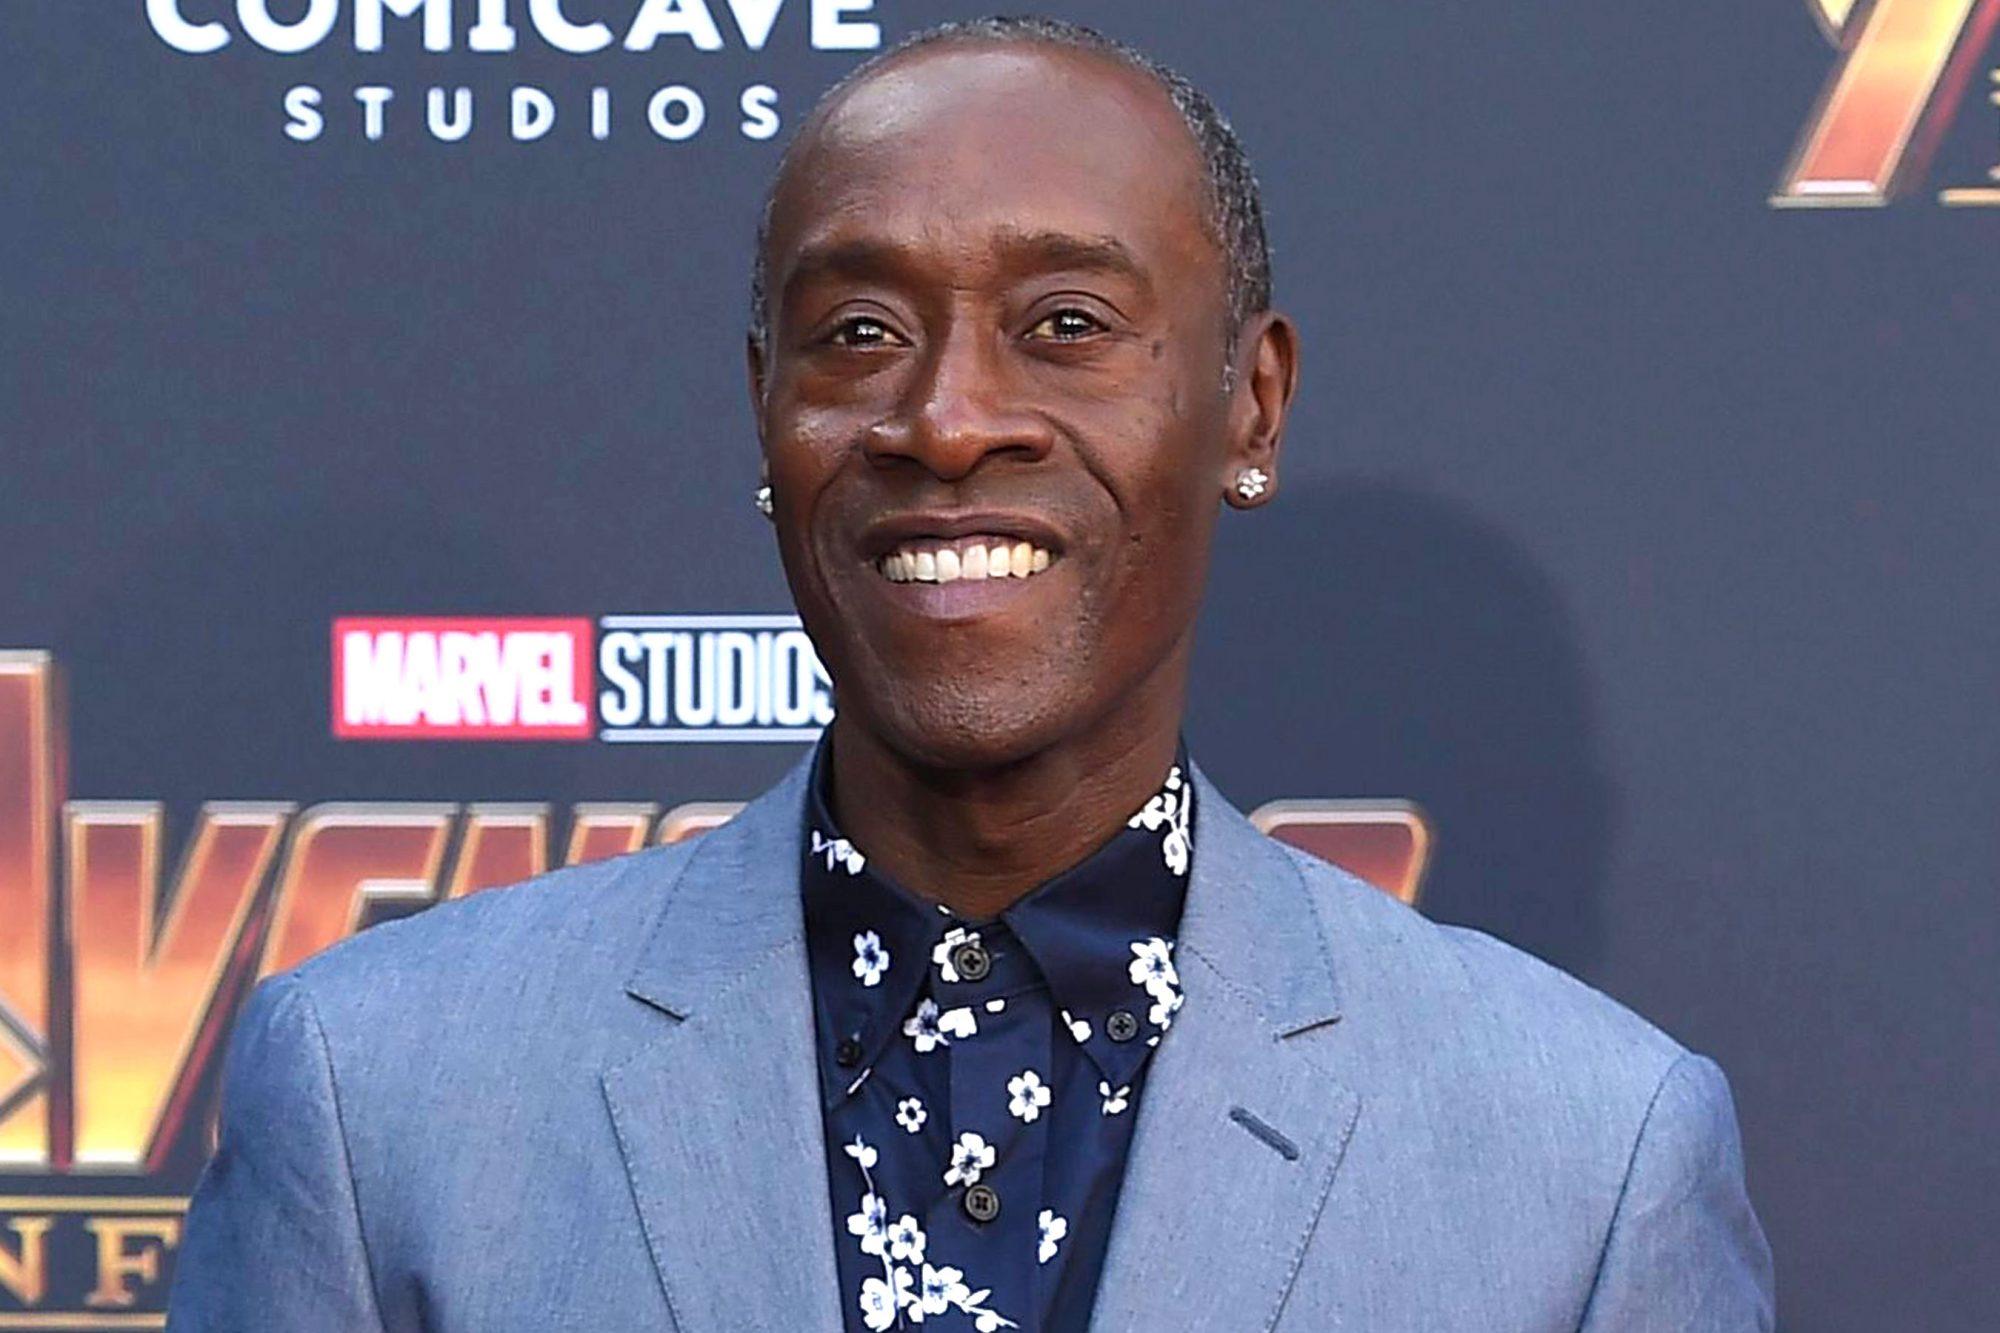 "World Premiere of ""Avengers: Infinity War"", Los Angeles, USA - 23 Apr 2018"